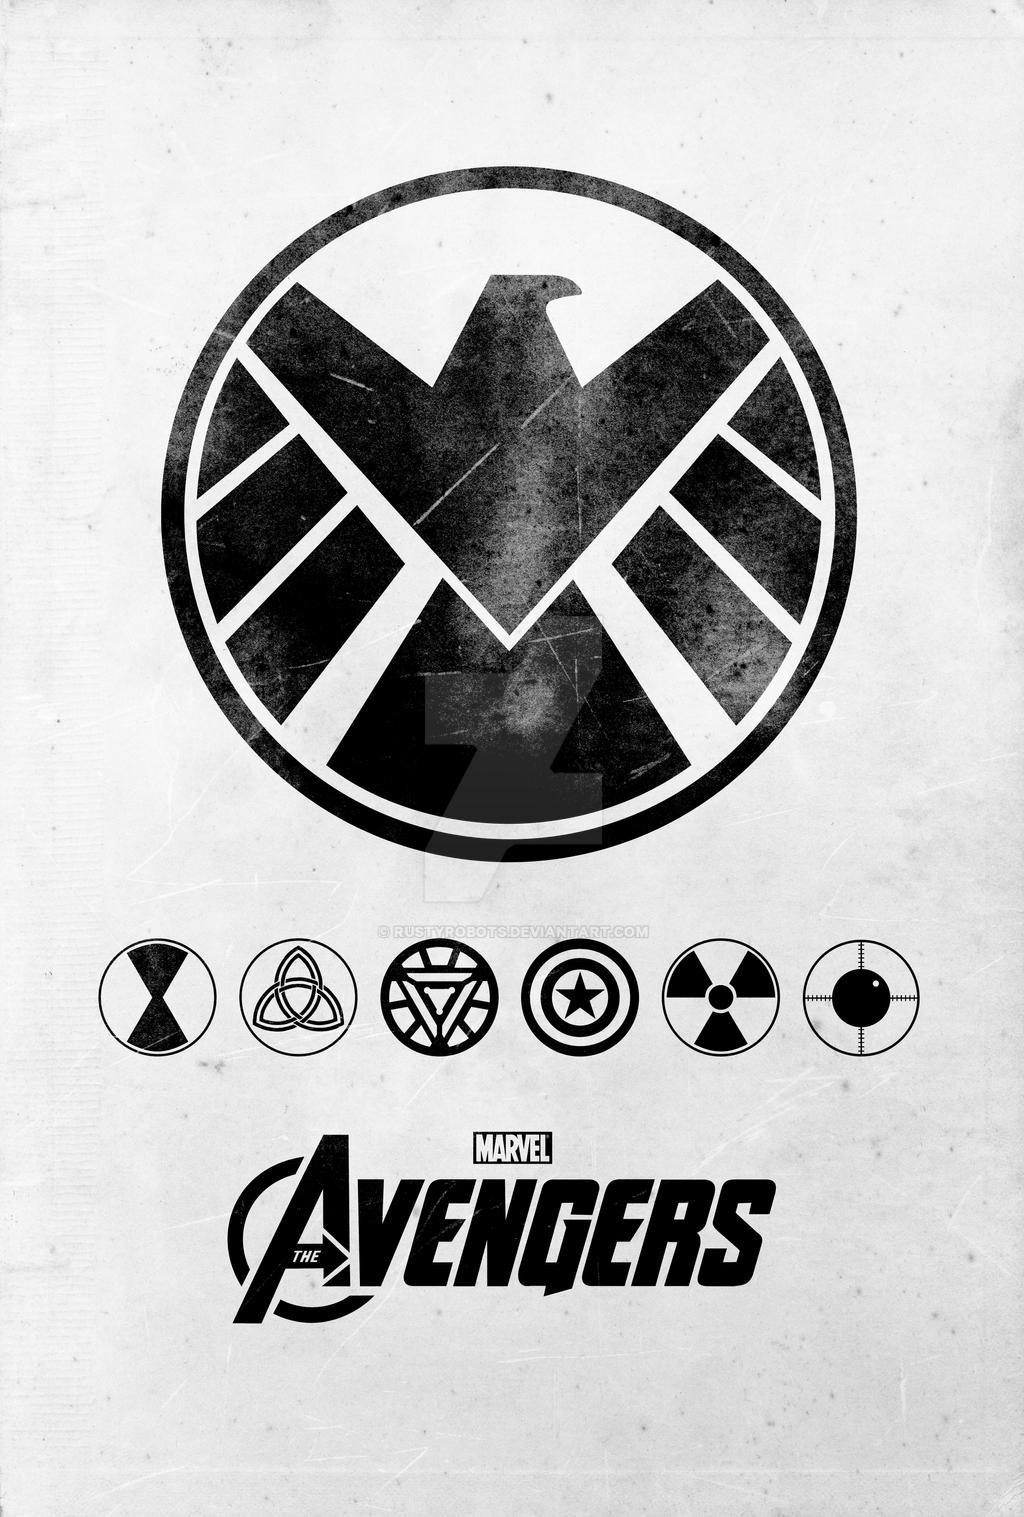 Avengers Poster by RustyRobots on DeviantArt